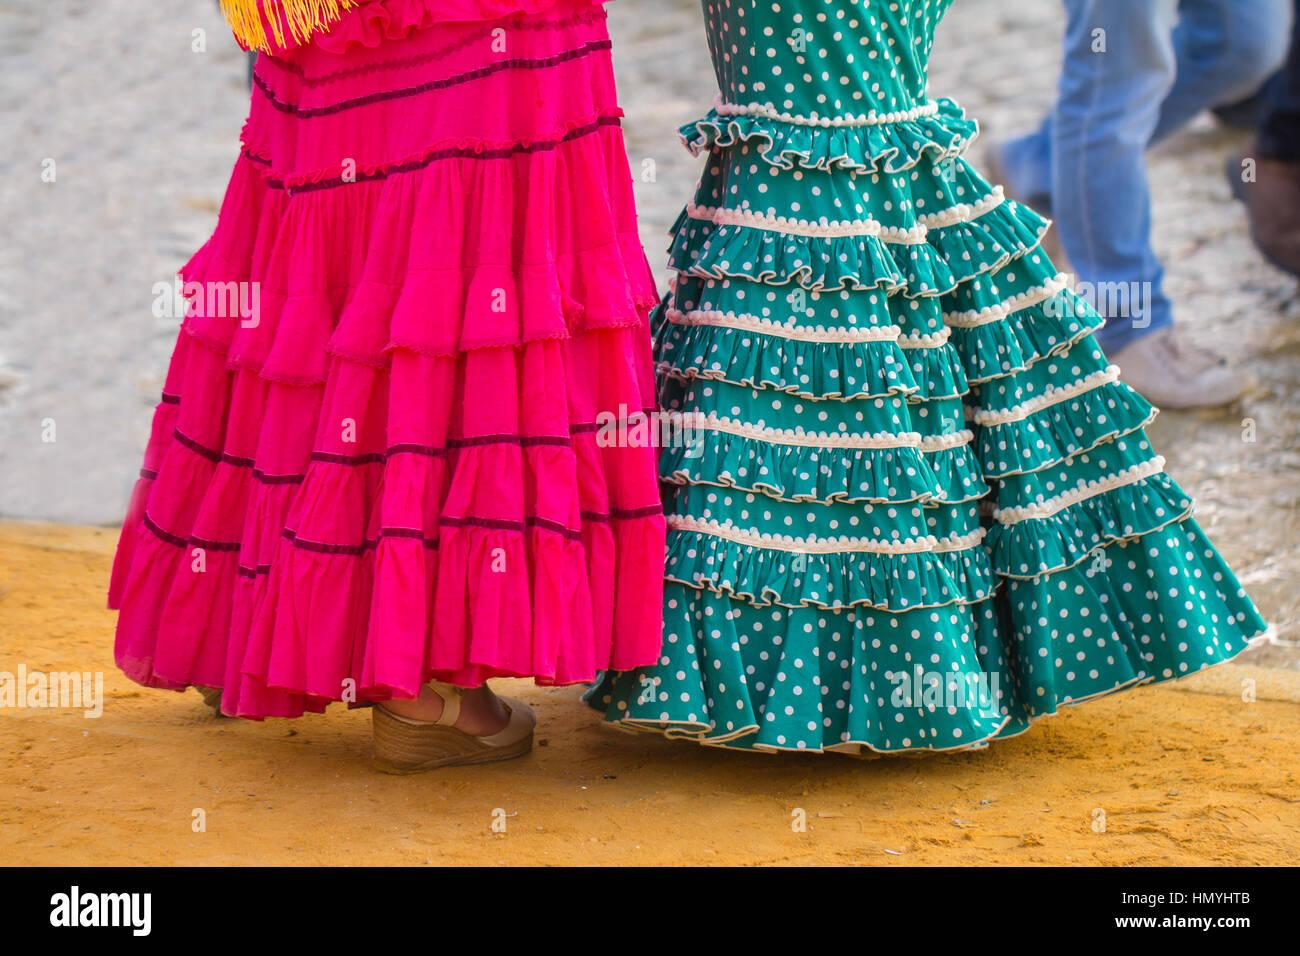 woman flamenco dress - Stock Image